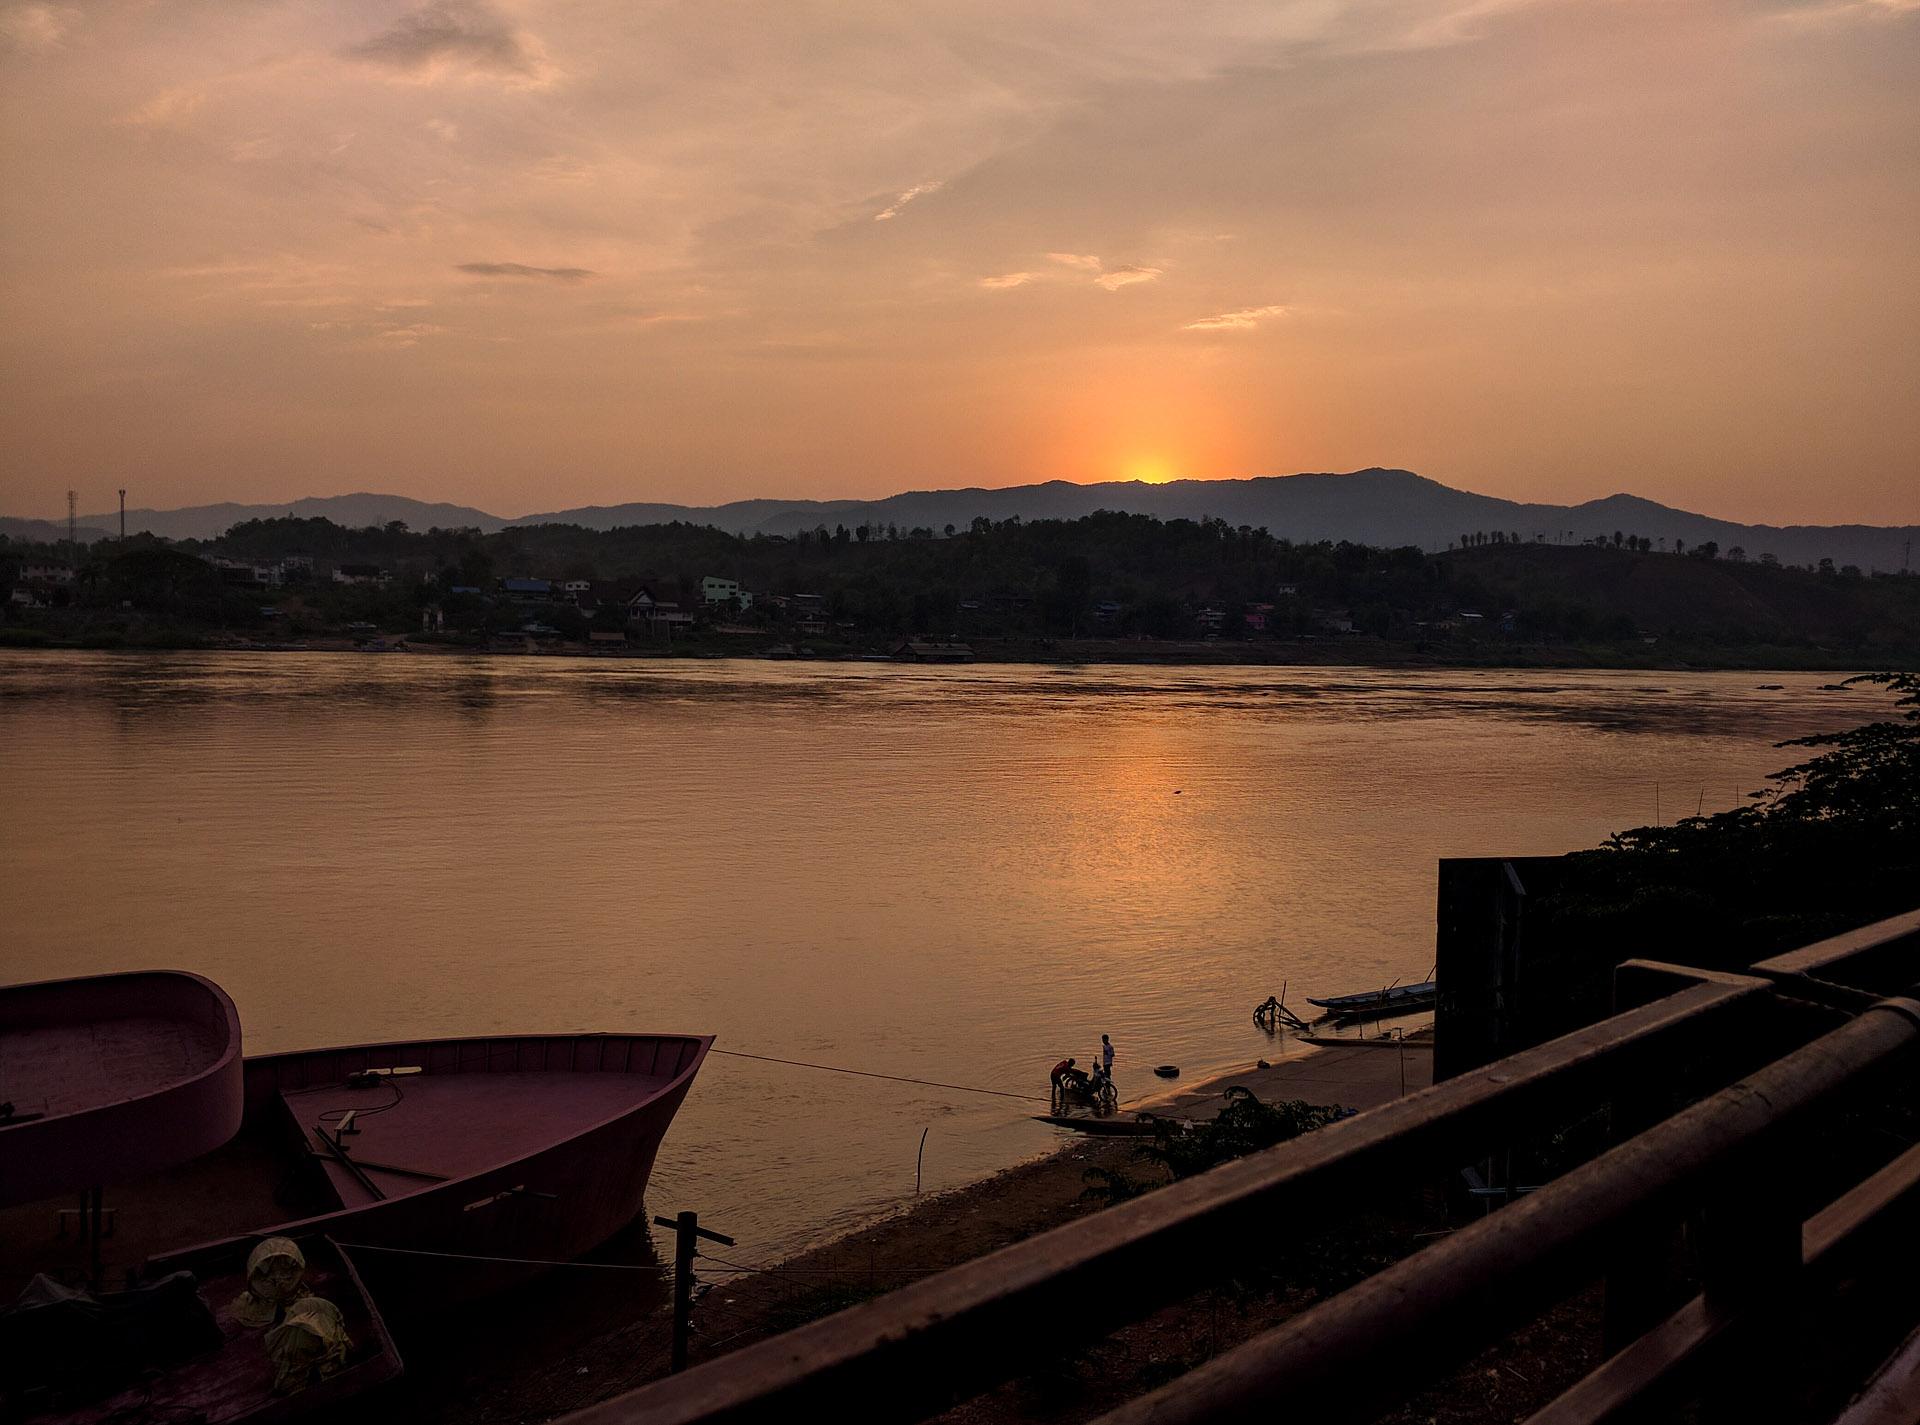 Mekong sunset (Houay Xai, Laos)